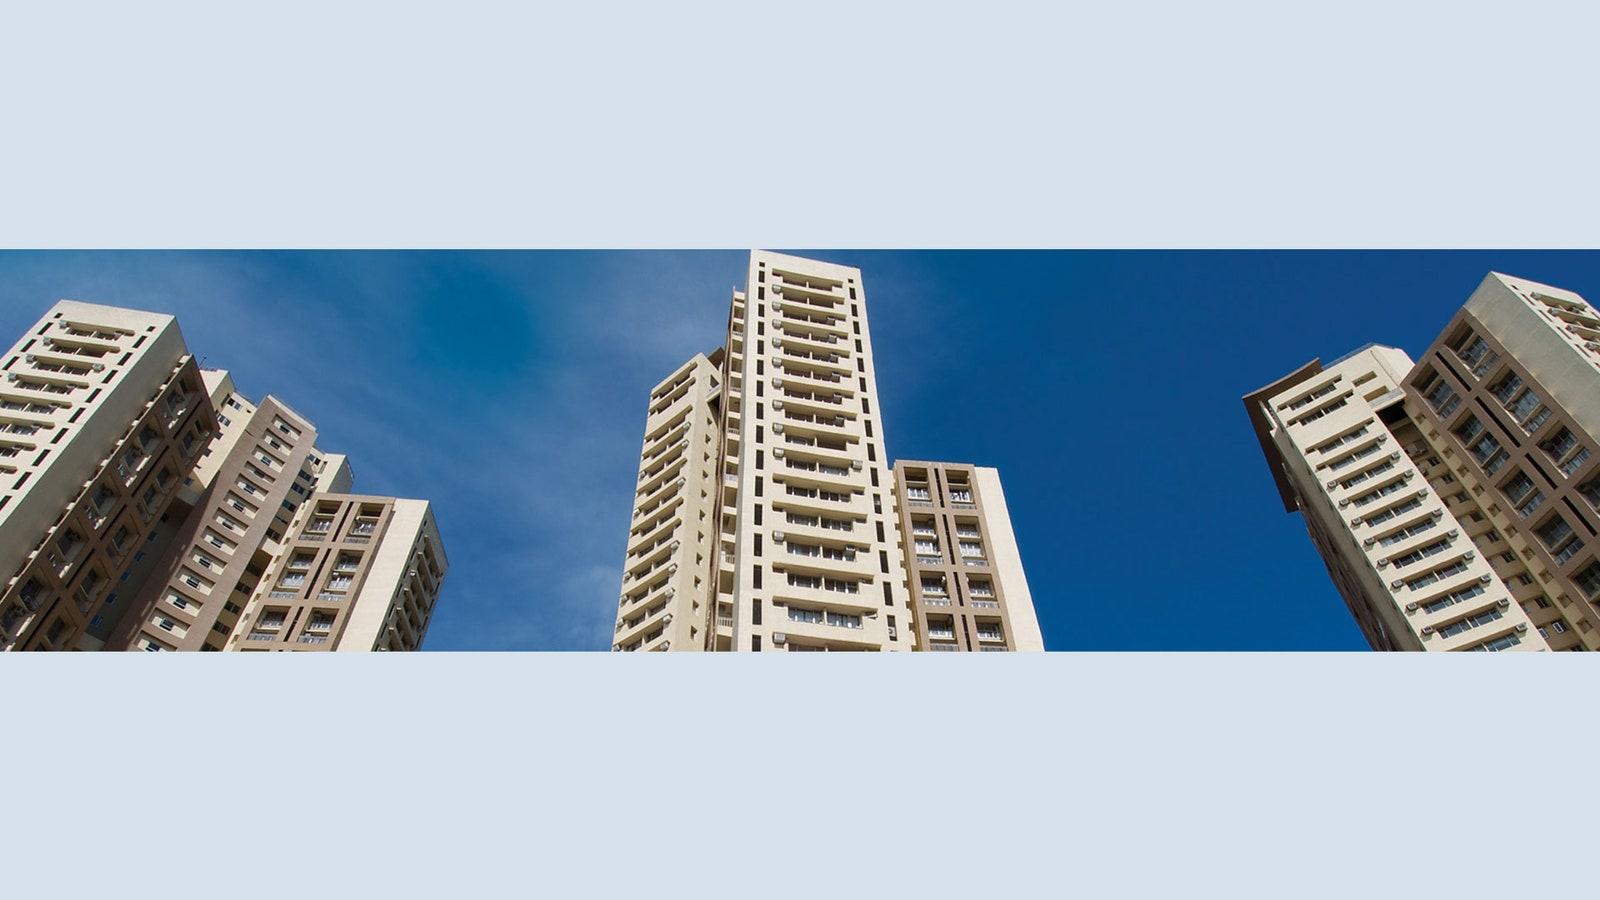 2-BHK flat at Ashok Towers in Parel